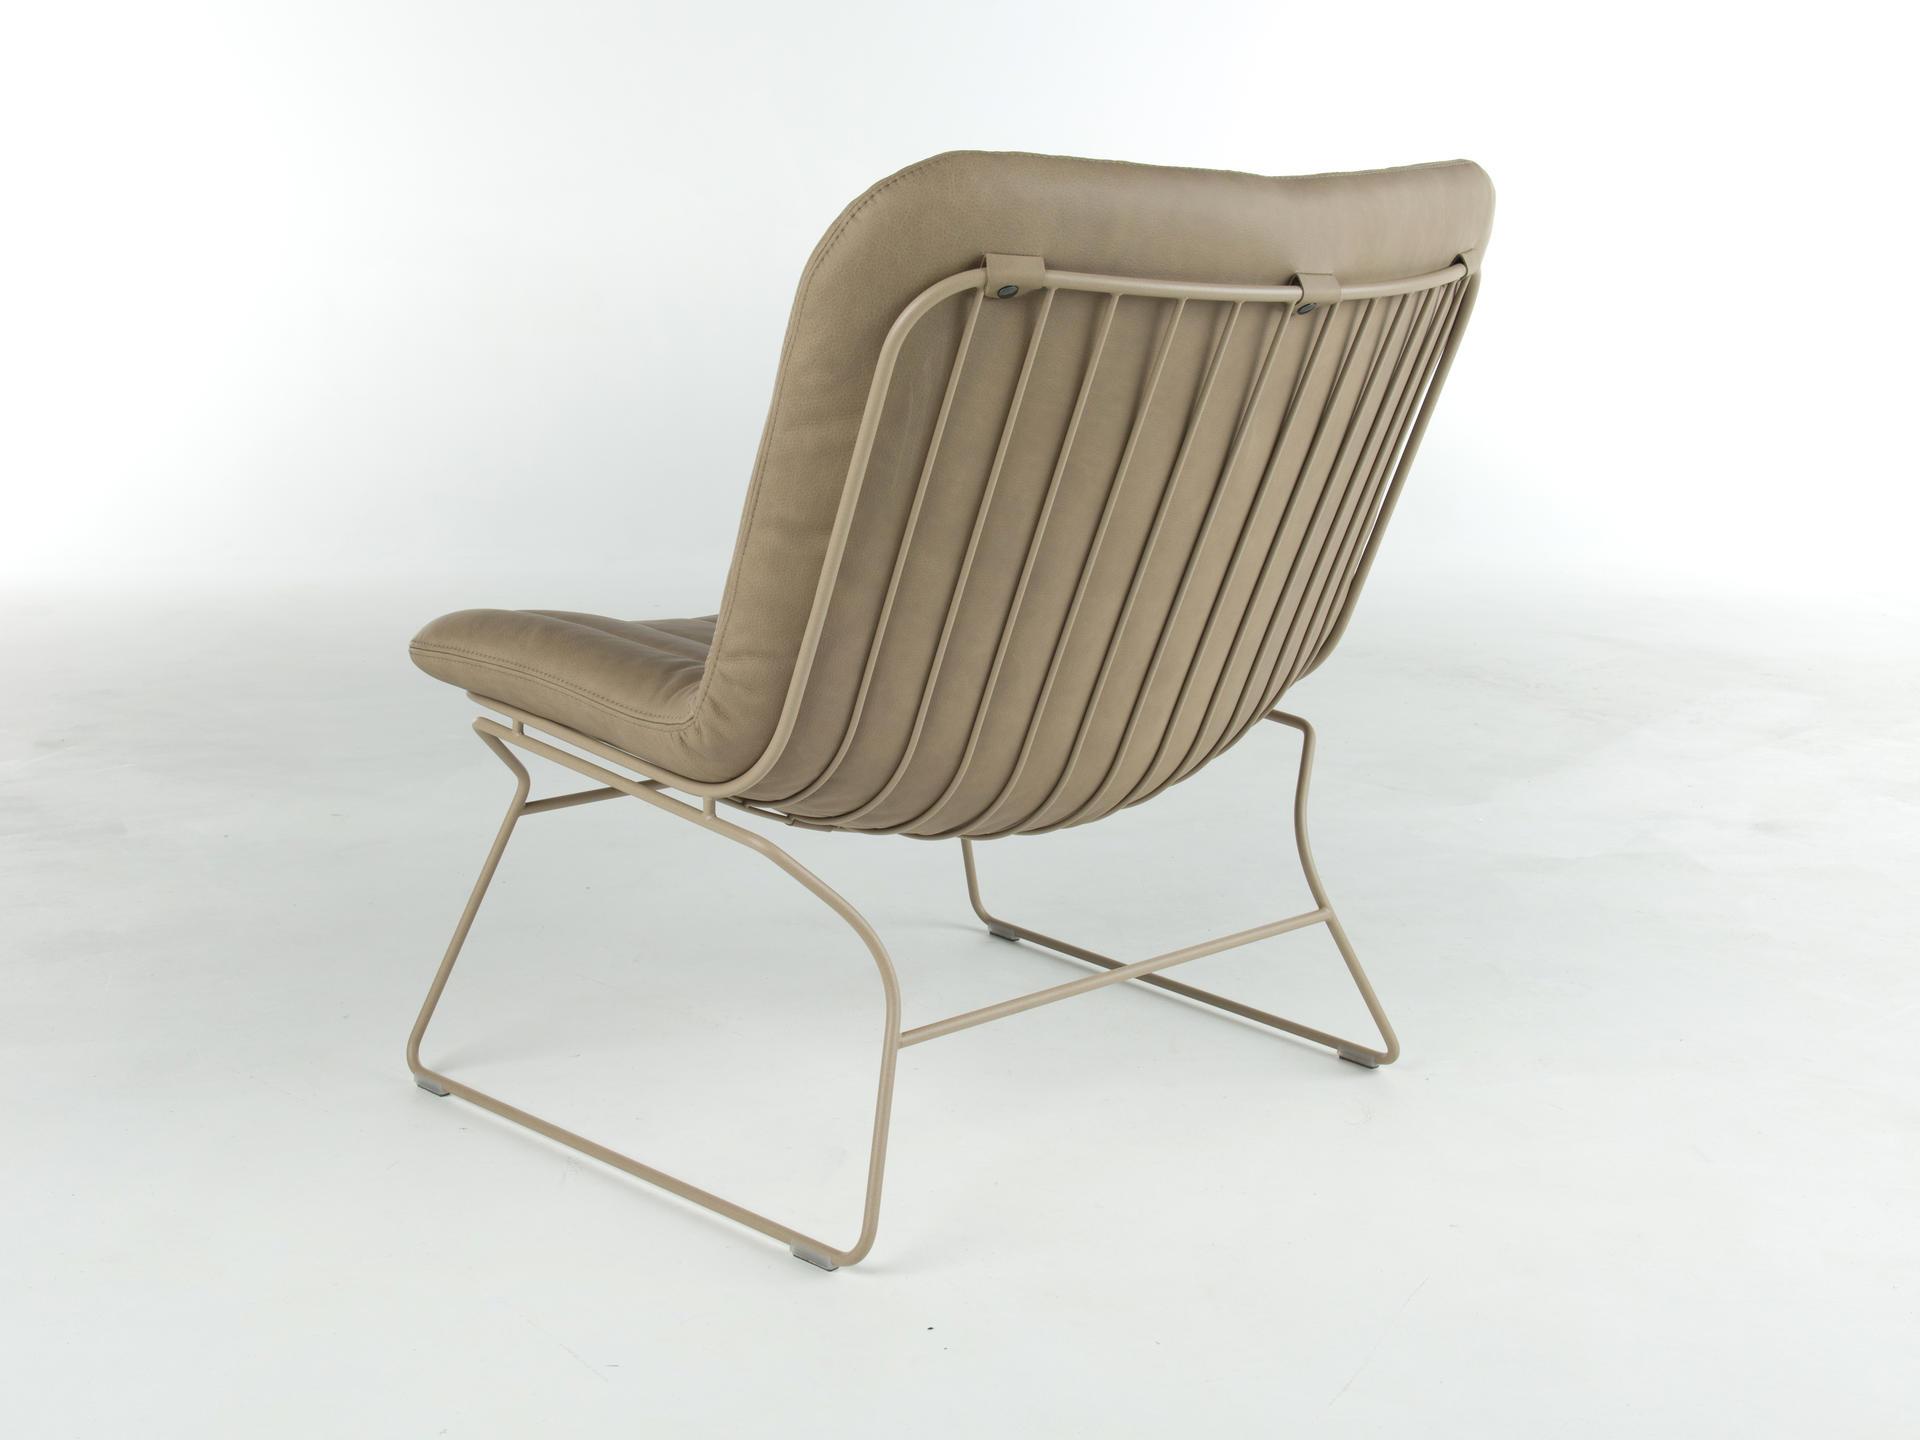 Кресло Draat, Bert Plantagie, фото 2